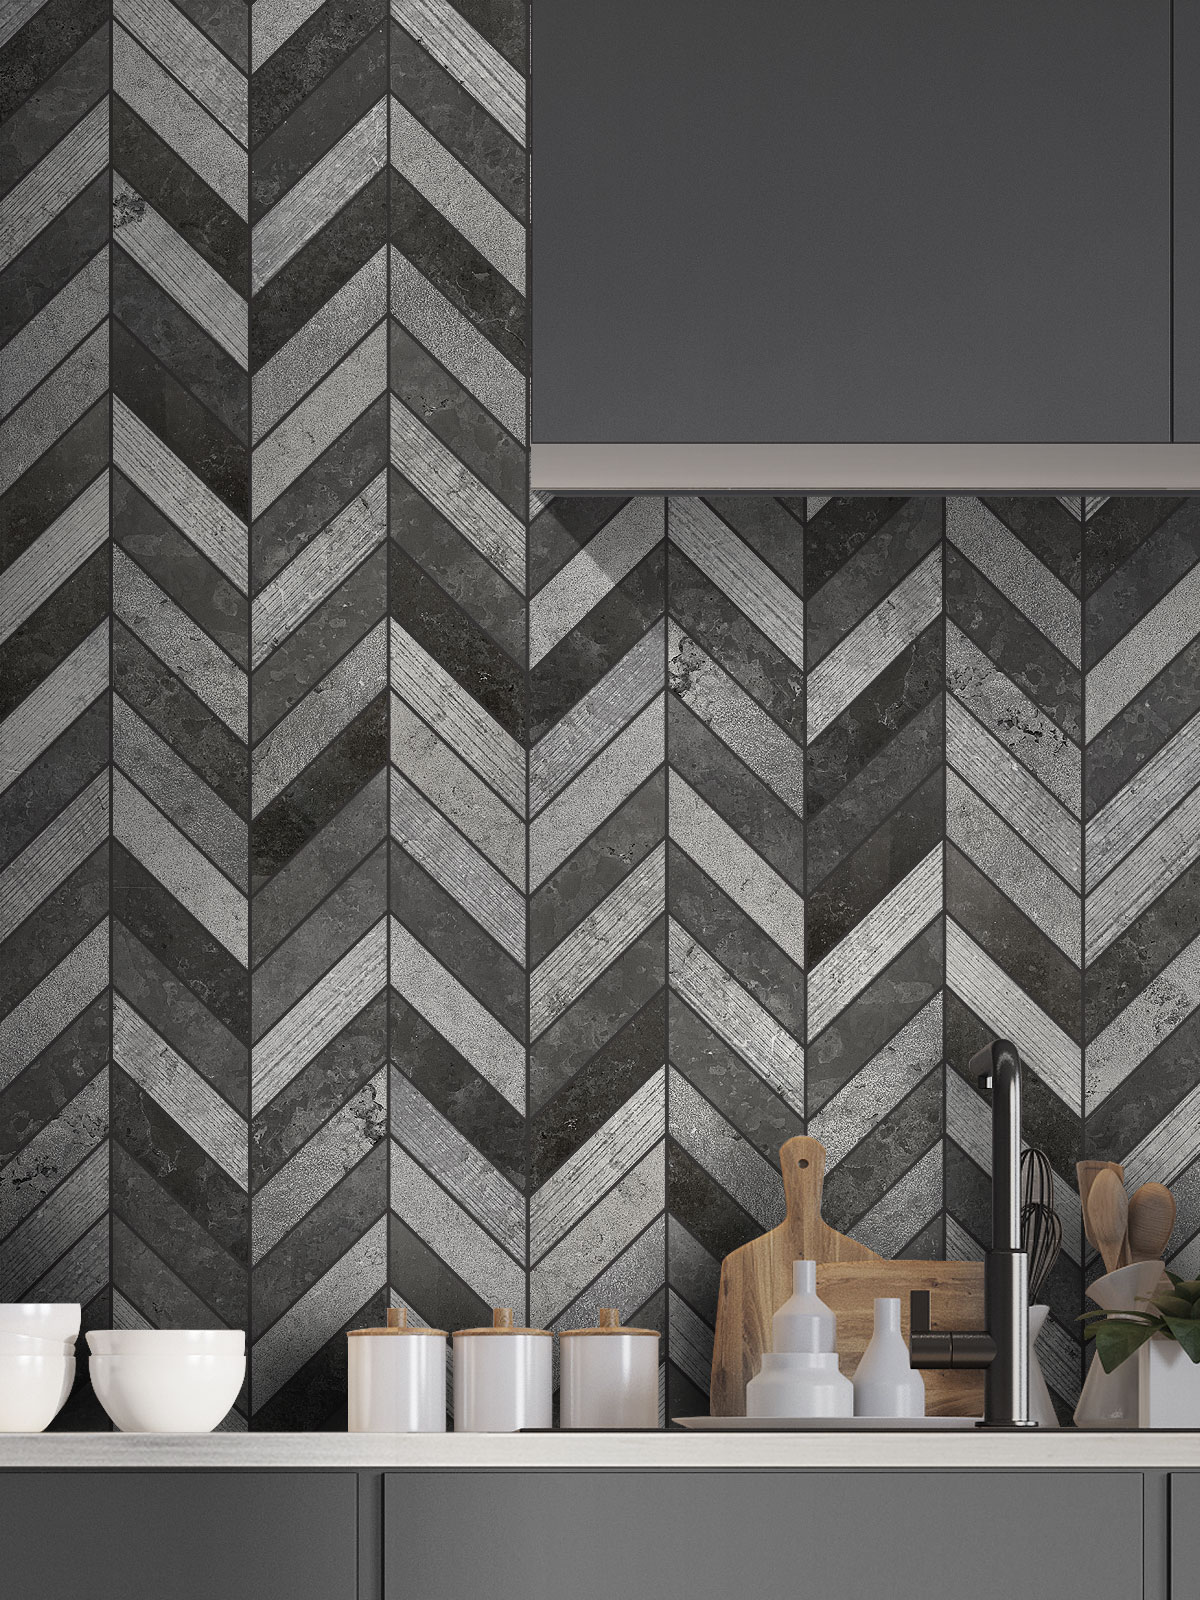 Black Gray modern limestone chevron mosaic backsplash tile cabinet BA631614